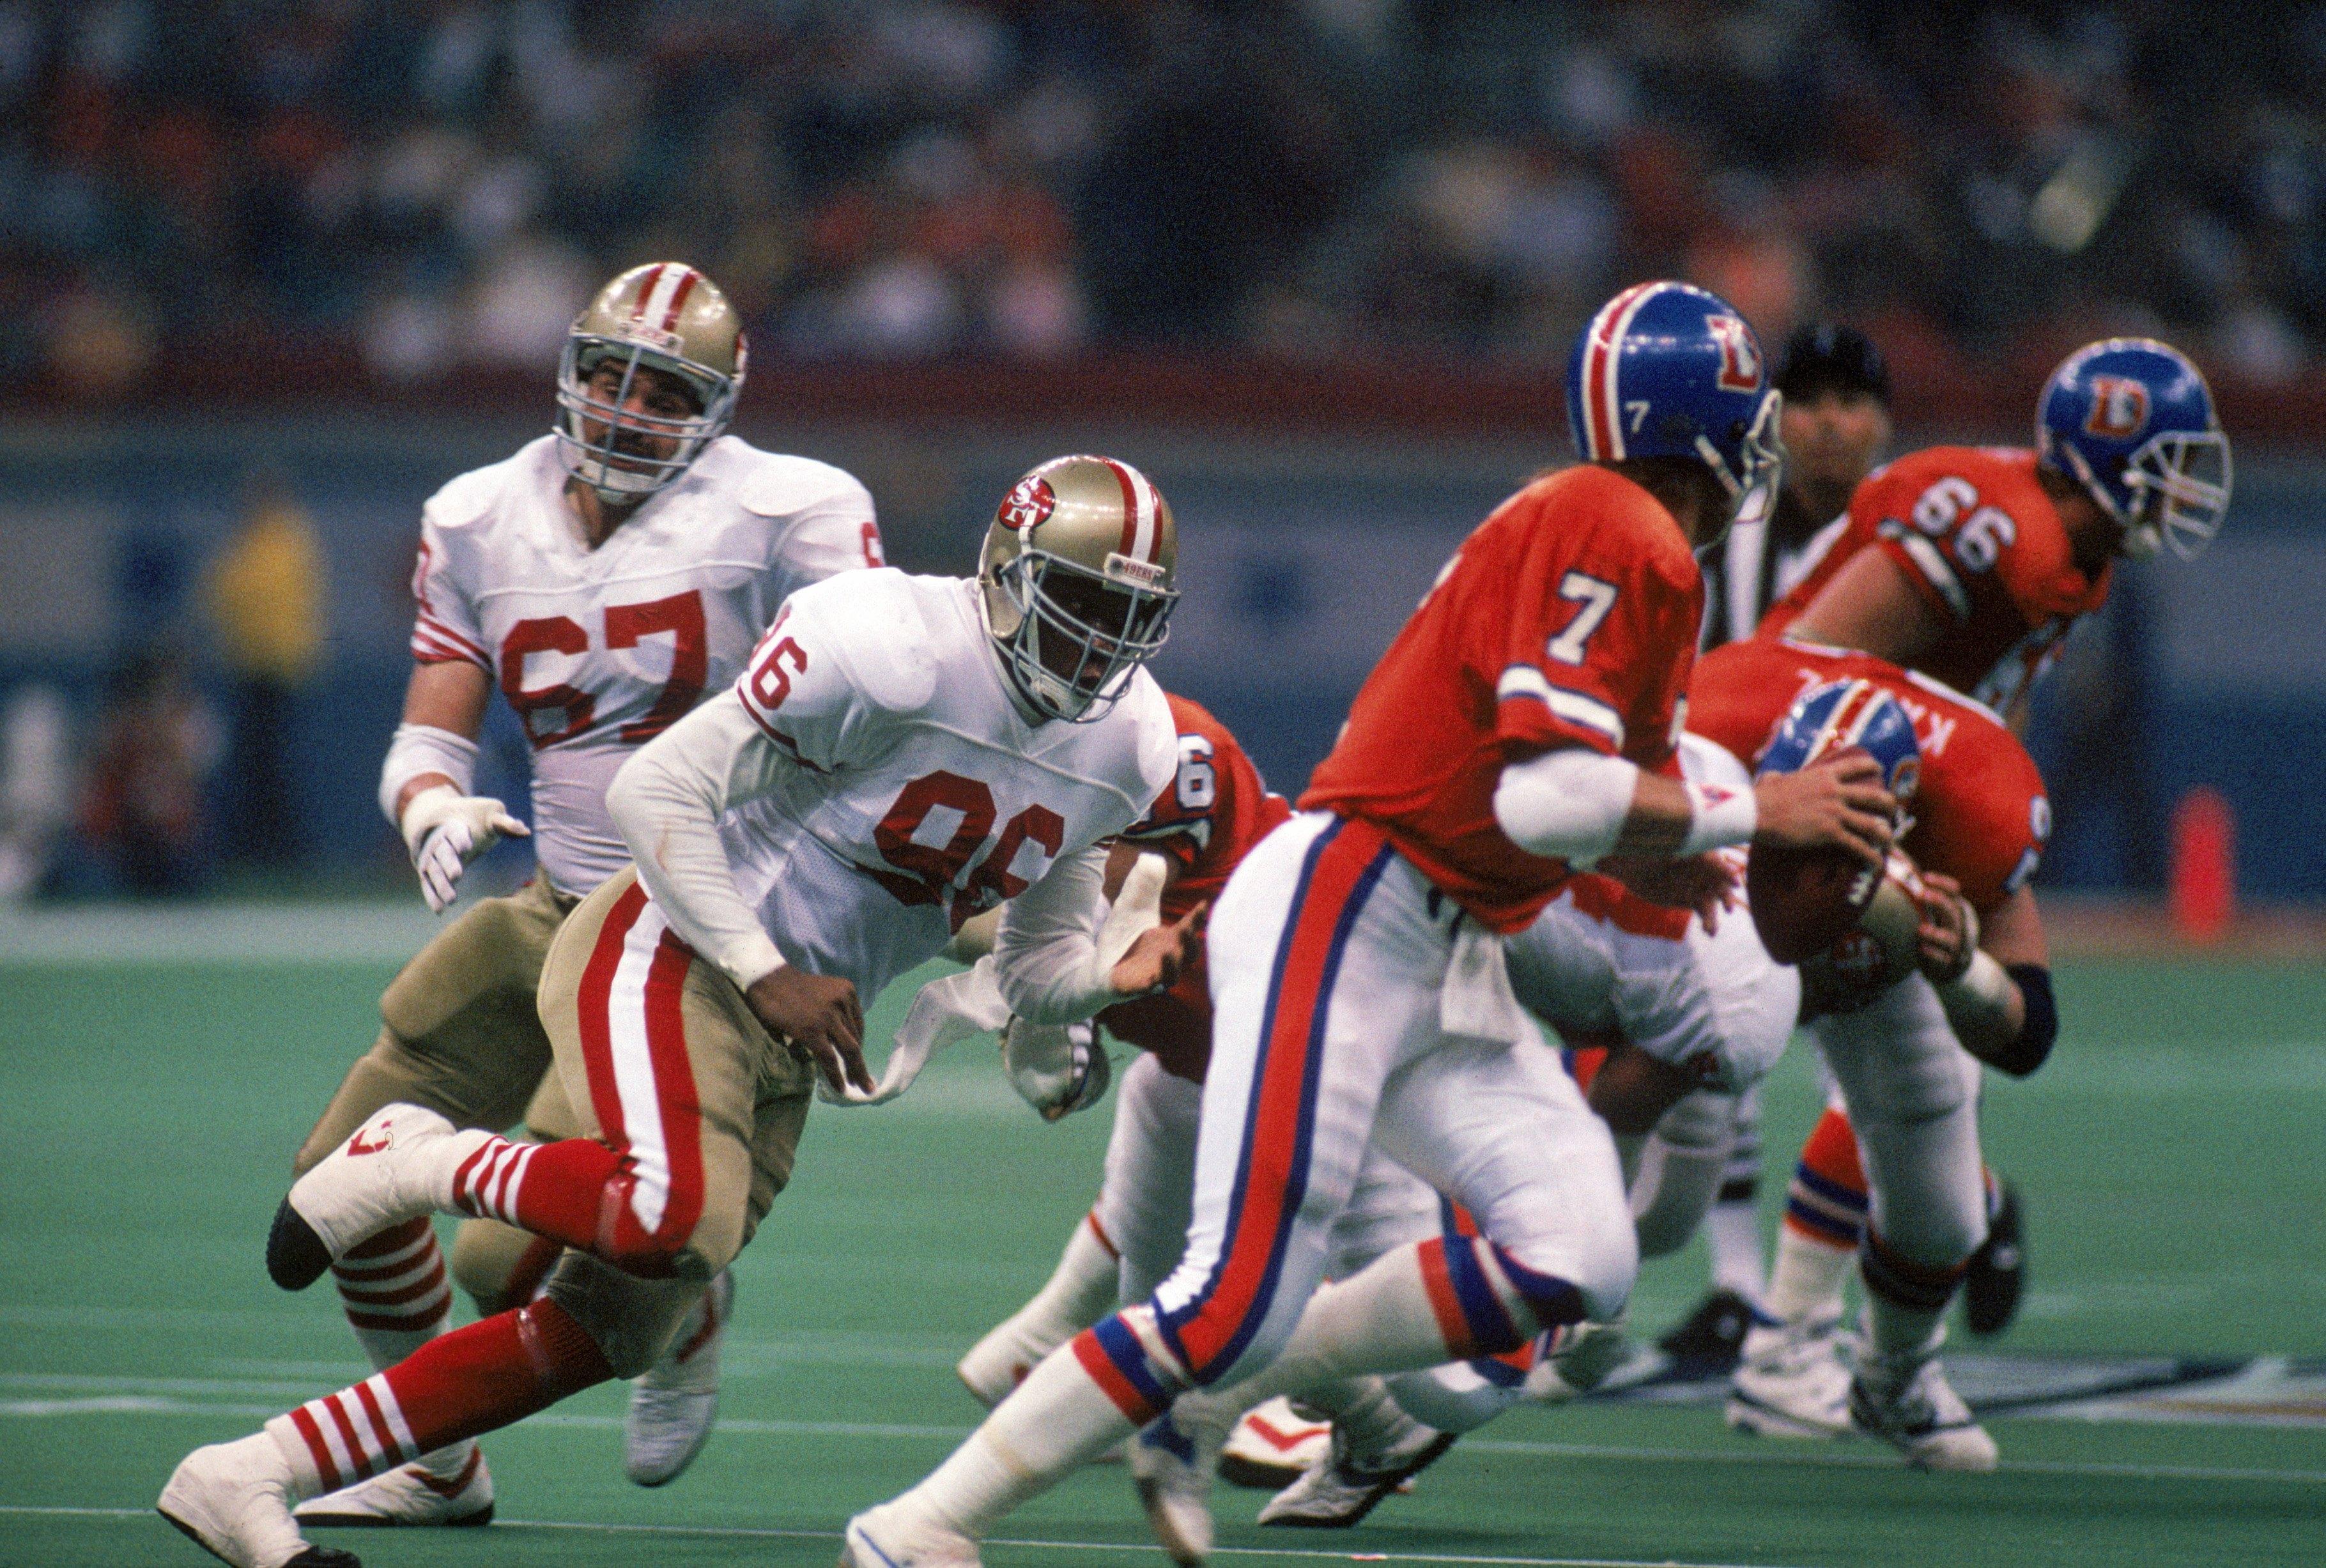 NEW ORLEANS - JANUARY 28:  Defensive end Daniel Stubbs #96 of the San Francisco 49ers pursues Denver Broncos quarterback John Elway #7 in Super Bowl XXIV at Louisiana Superdome on January 28, 1990 in New Orleans, Louisiana.  The 49ers won 55-10.  (Photo b